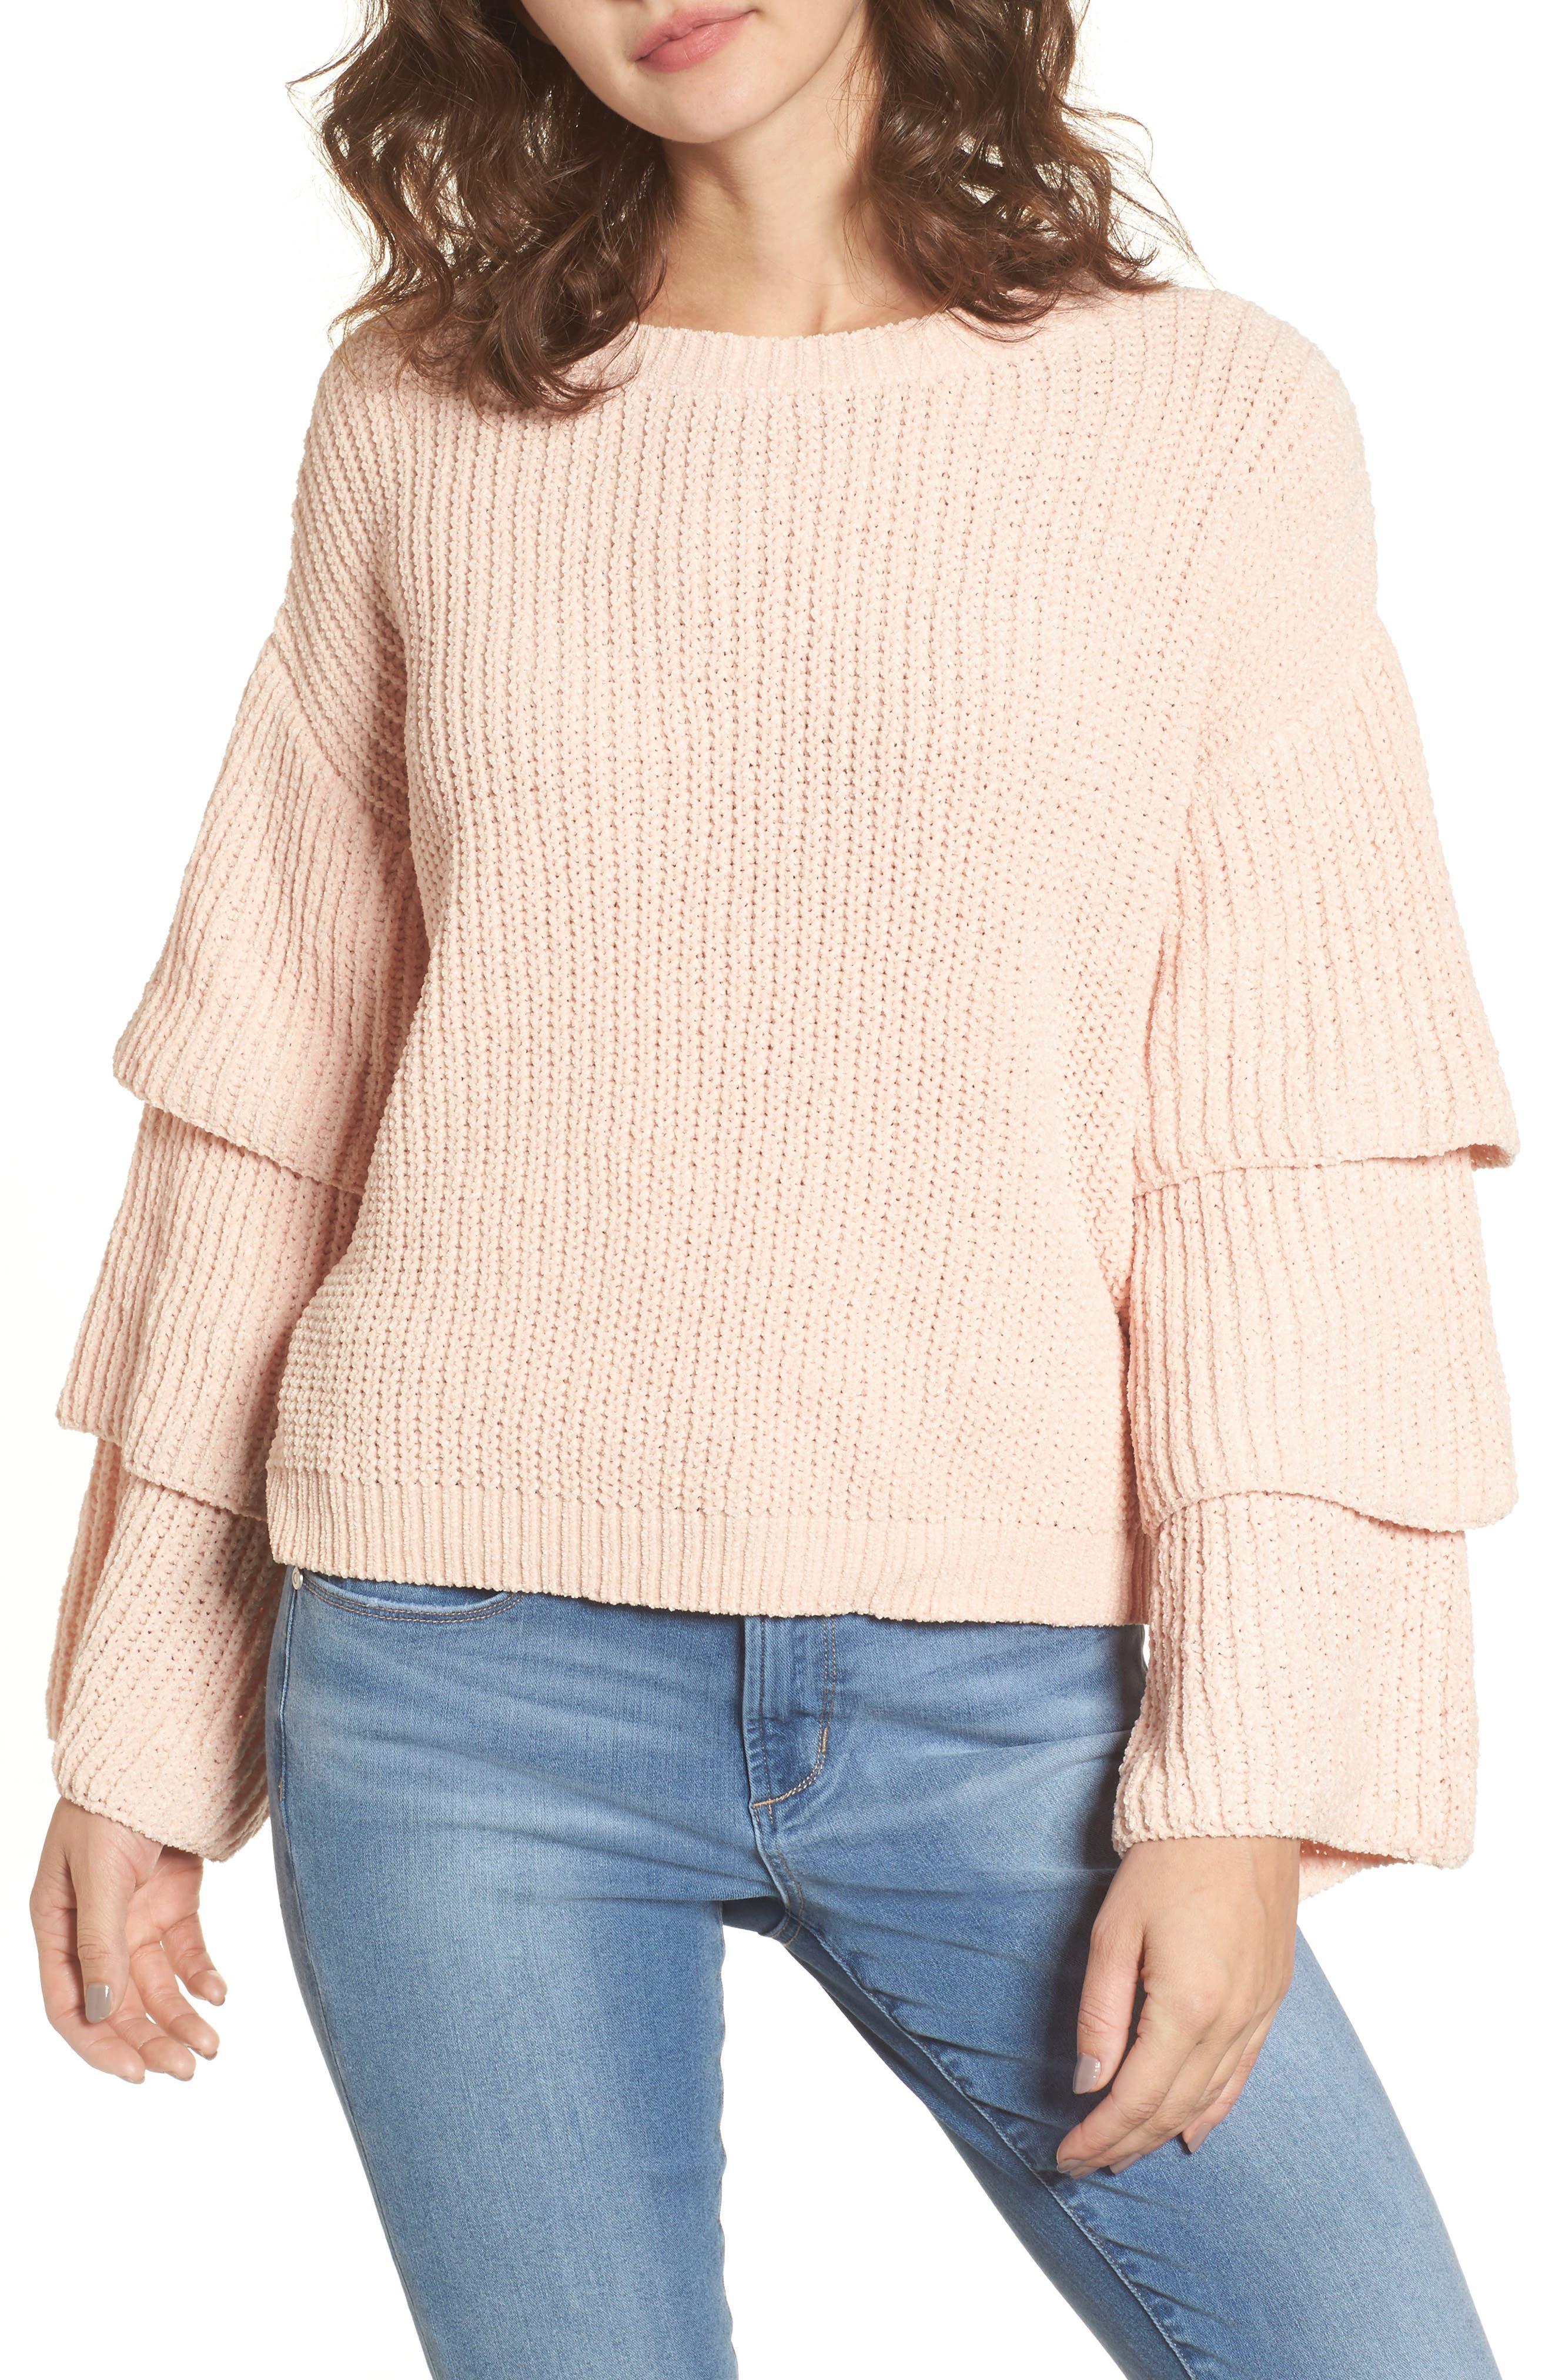 Alternate Image 1 Selected - Woven Heart Triple Ruffle Sweater